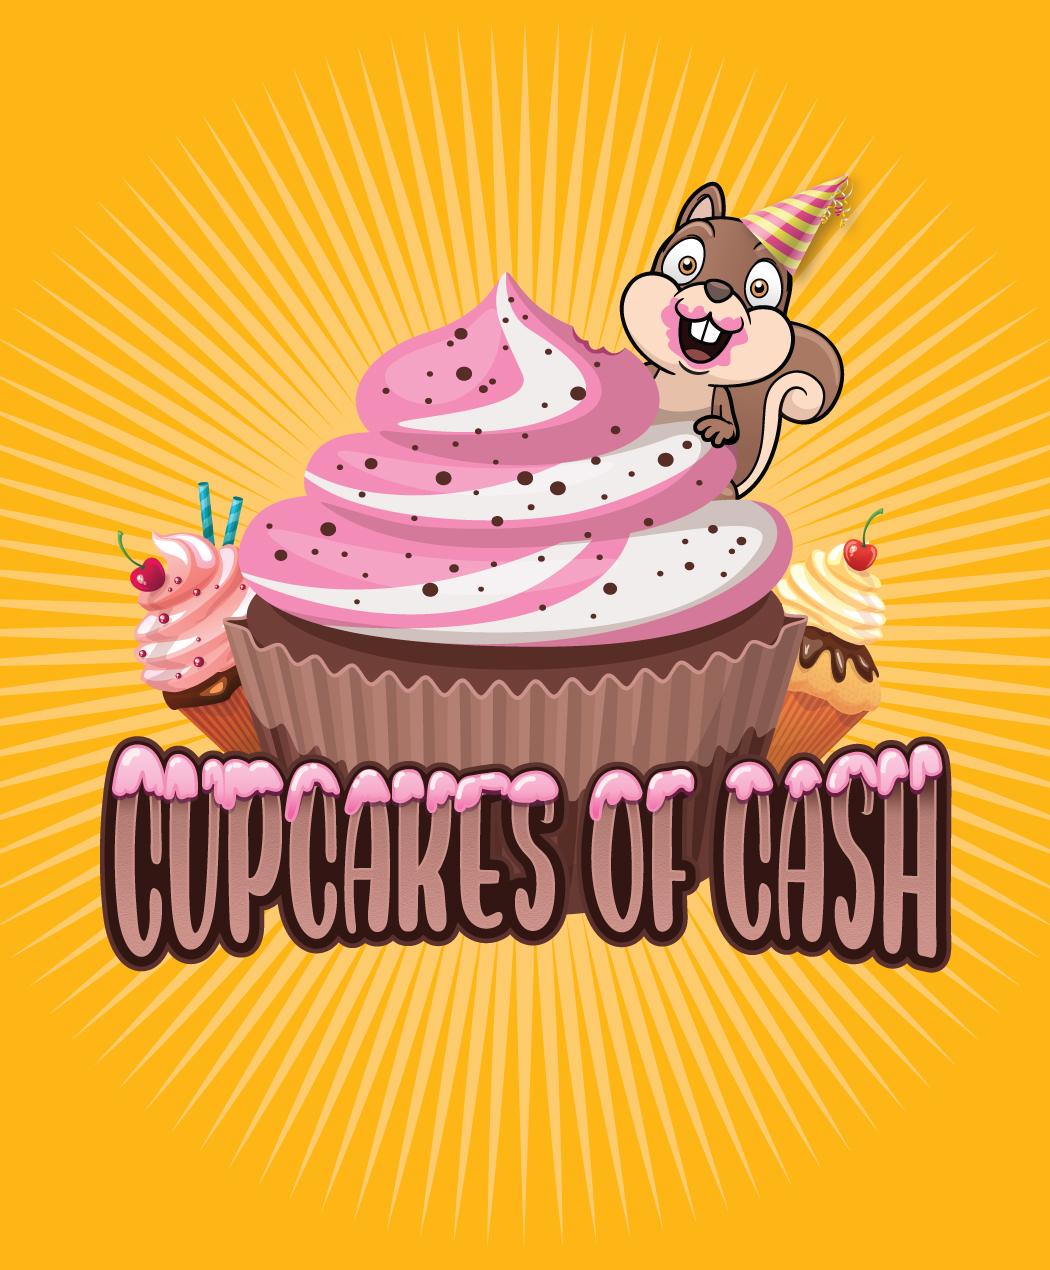 Cupcakes of Cash